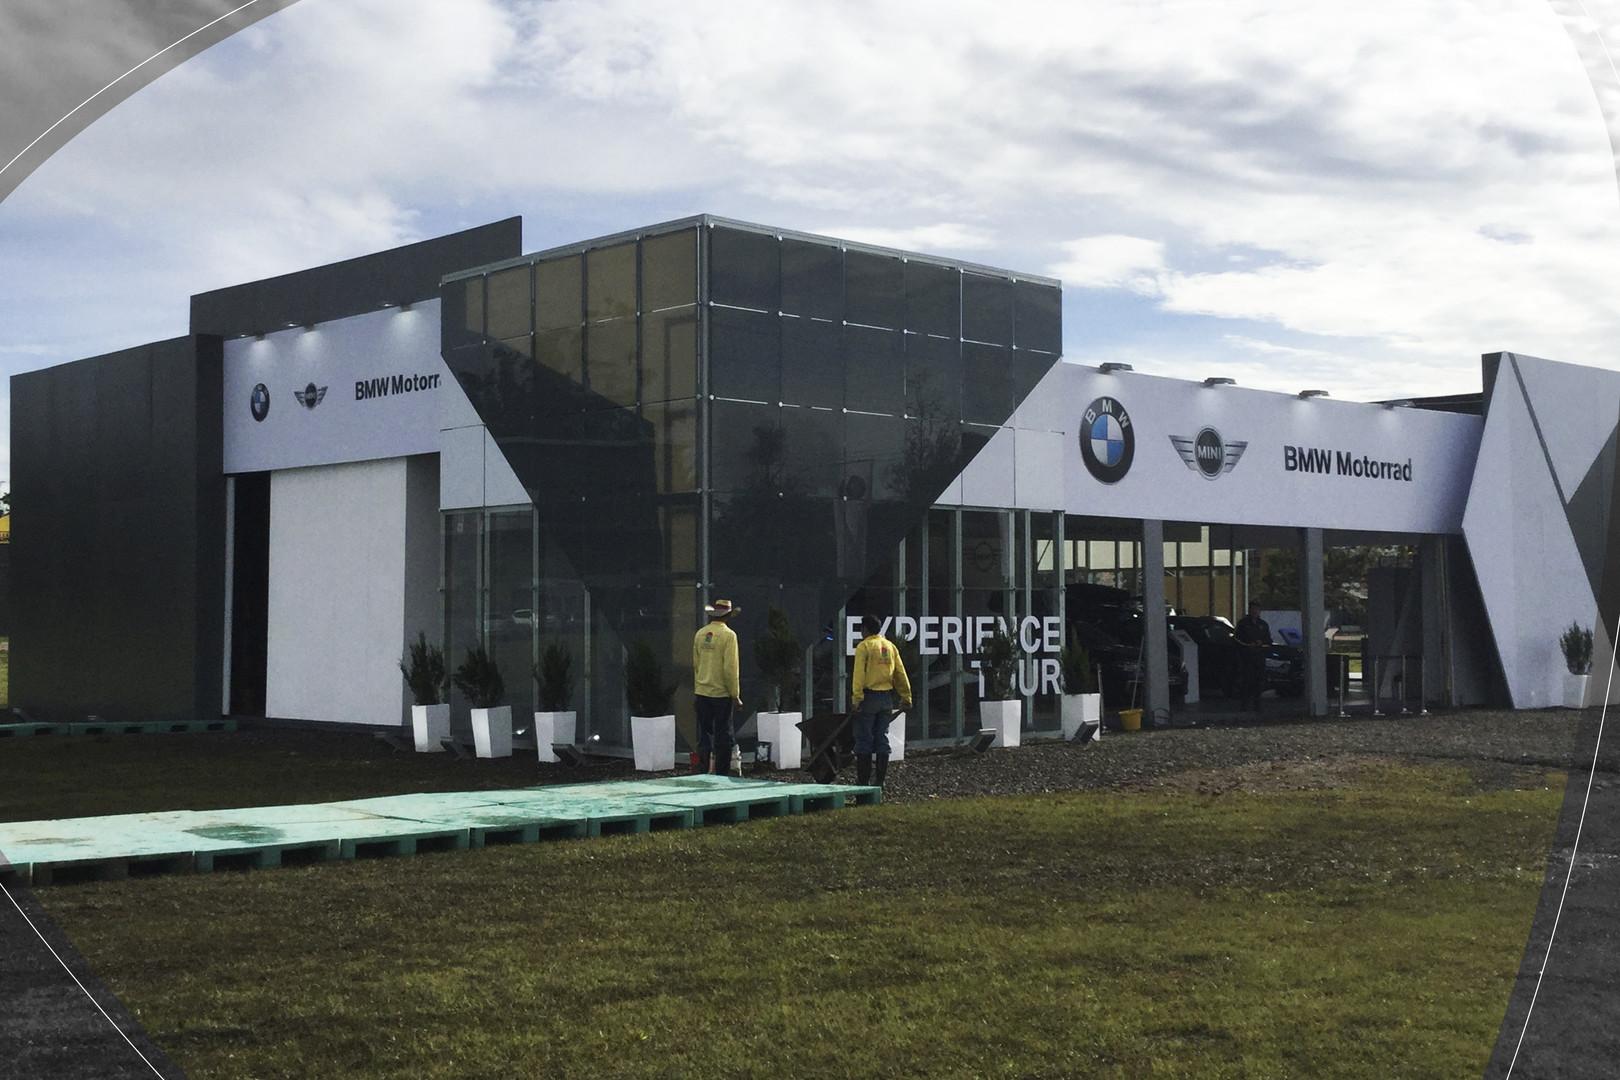 BMW X2 Rionegro IMG_1864.JPG